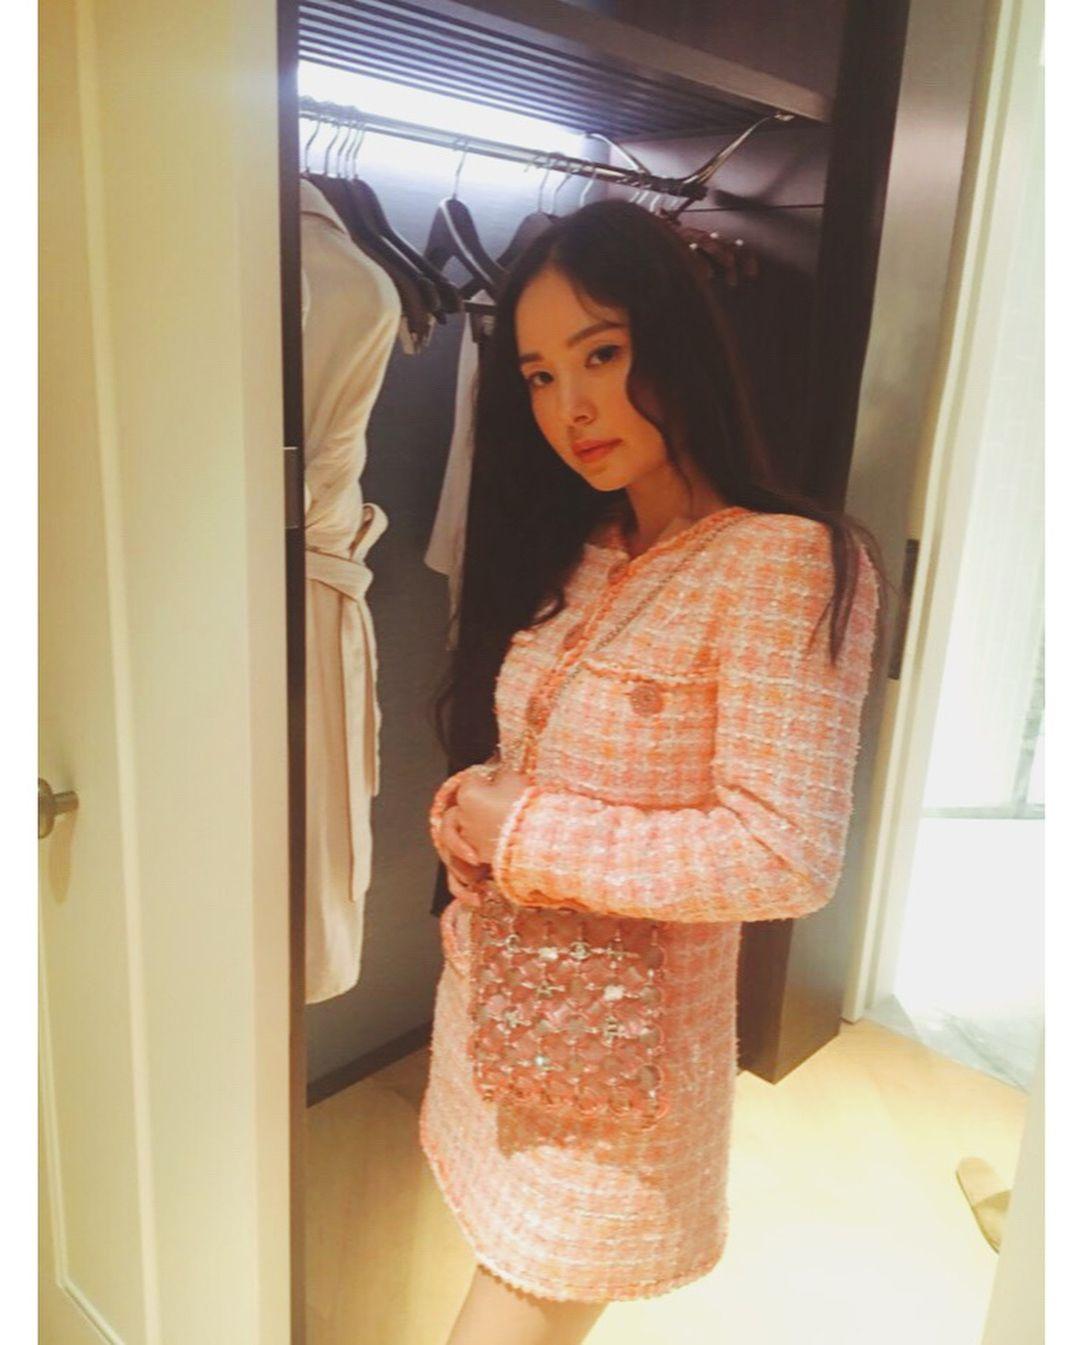 Siap Jadi Ibu! Begini Potret Modis Min Hyo Rin di Media Sosial